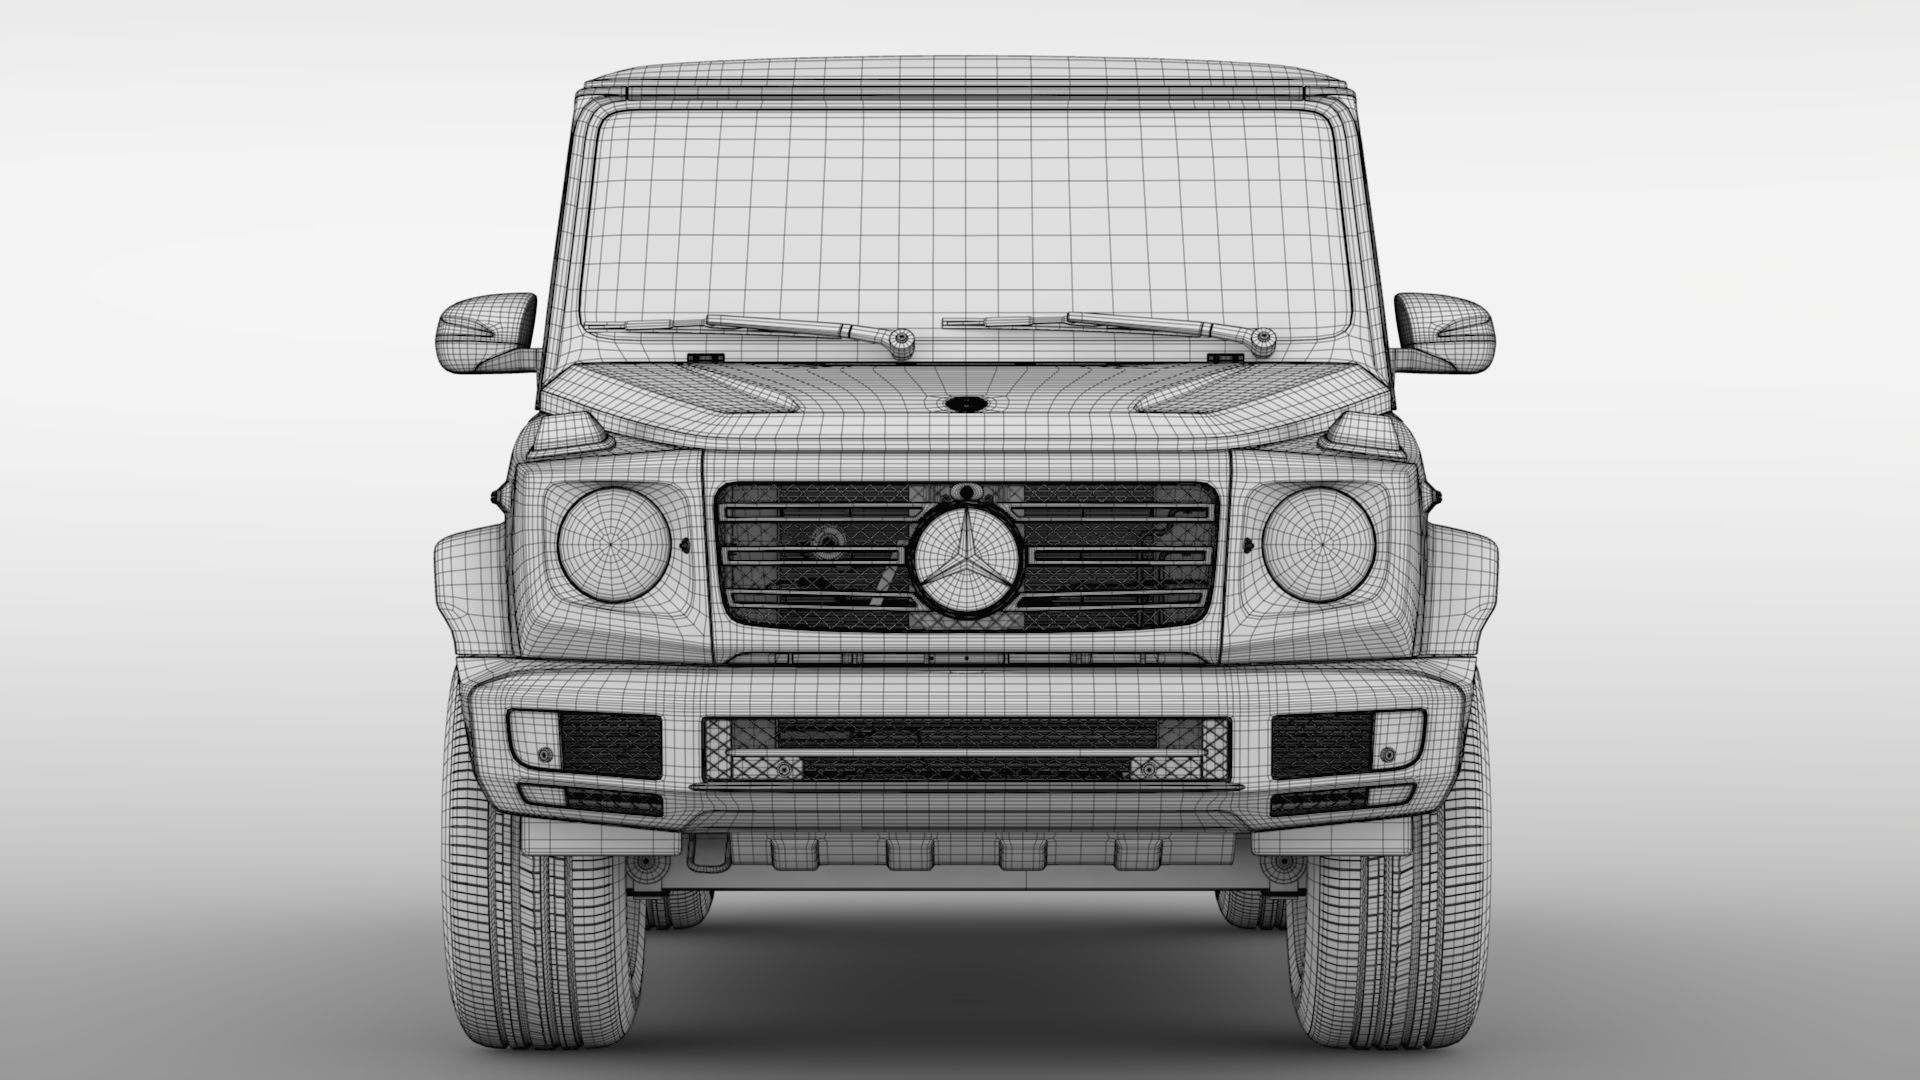 mercedes-benz g 550 (w464) 2018 3d model max fbx c4d lwo ma mb hrc xsi obj 277676